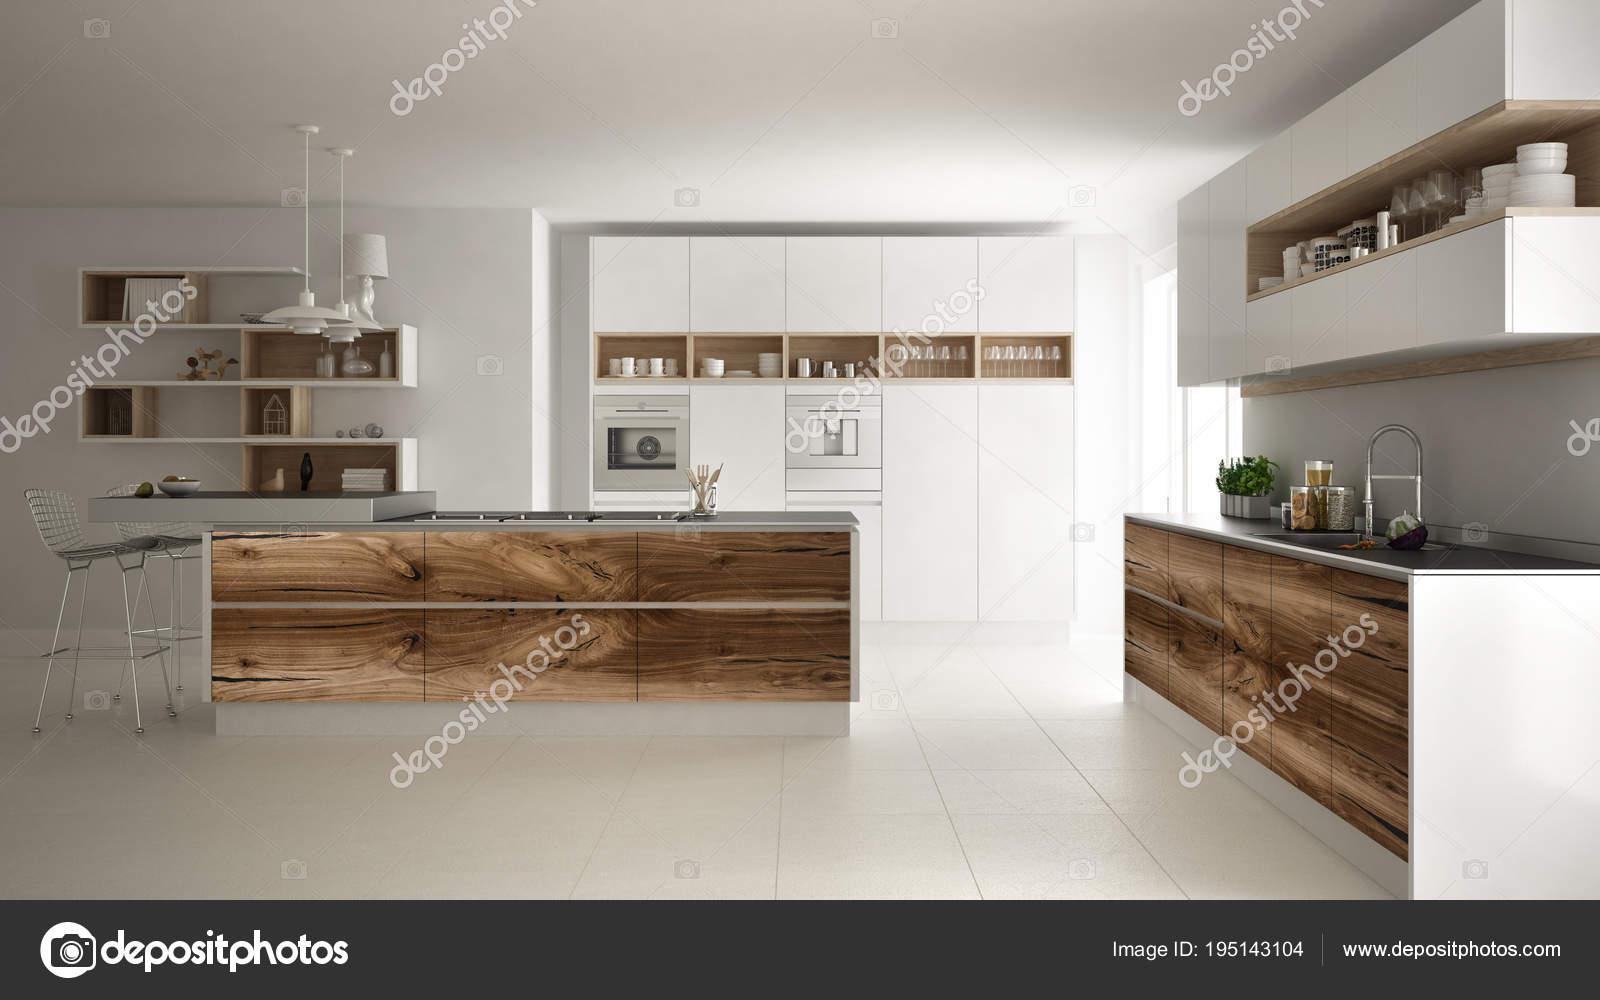 Cocina minimalista moderno blanco, con accesorios de madera clásico ...